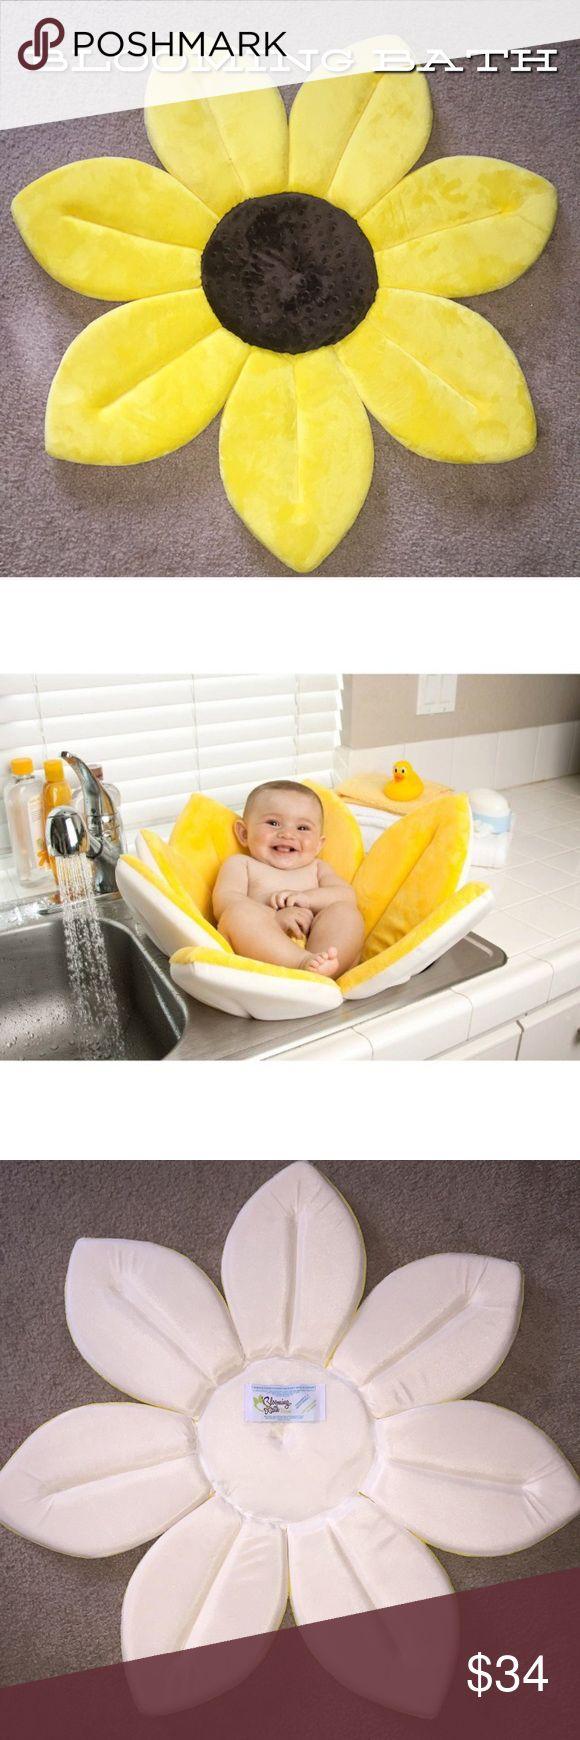 best 20 baby bath seat ideas on pinterest baby essentials bath blooming bath for babies yellow flower